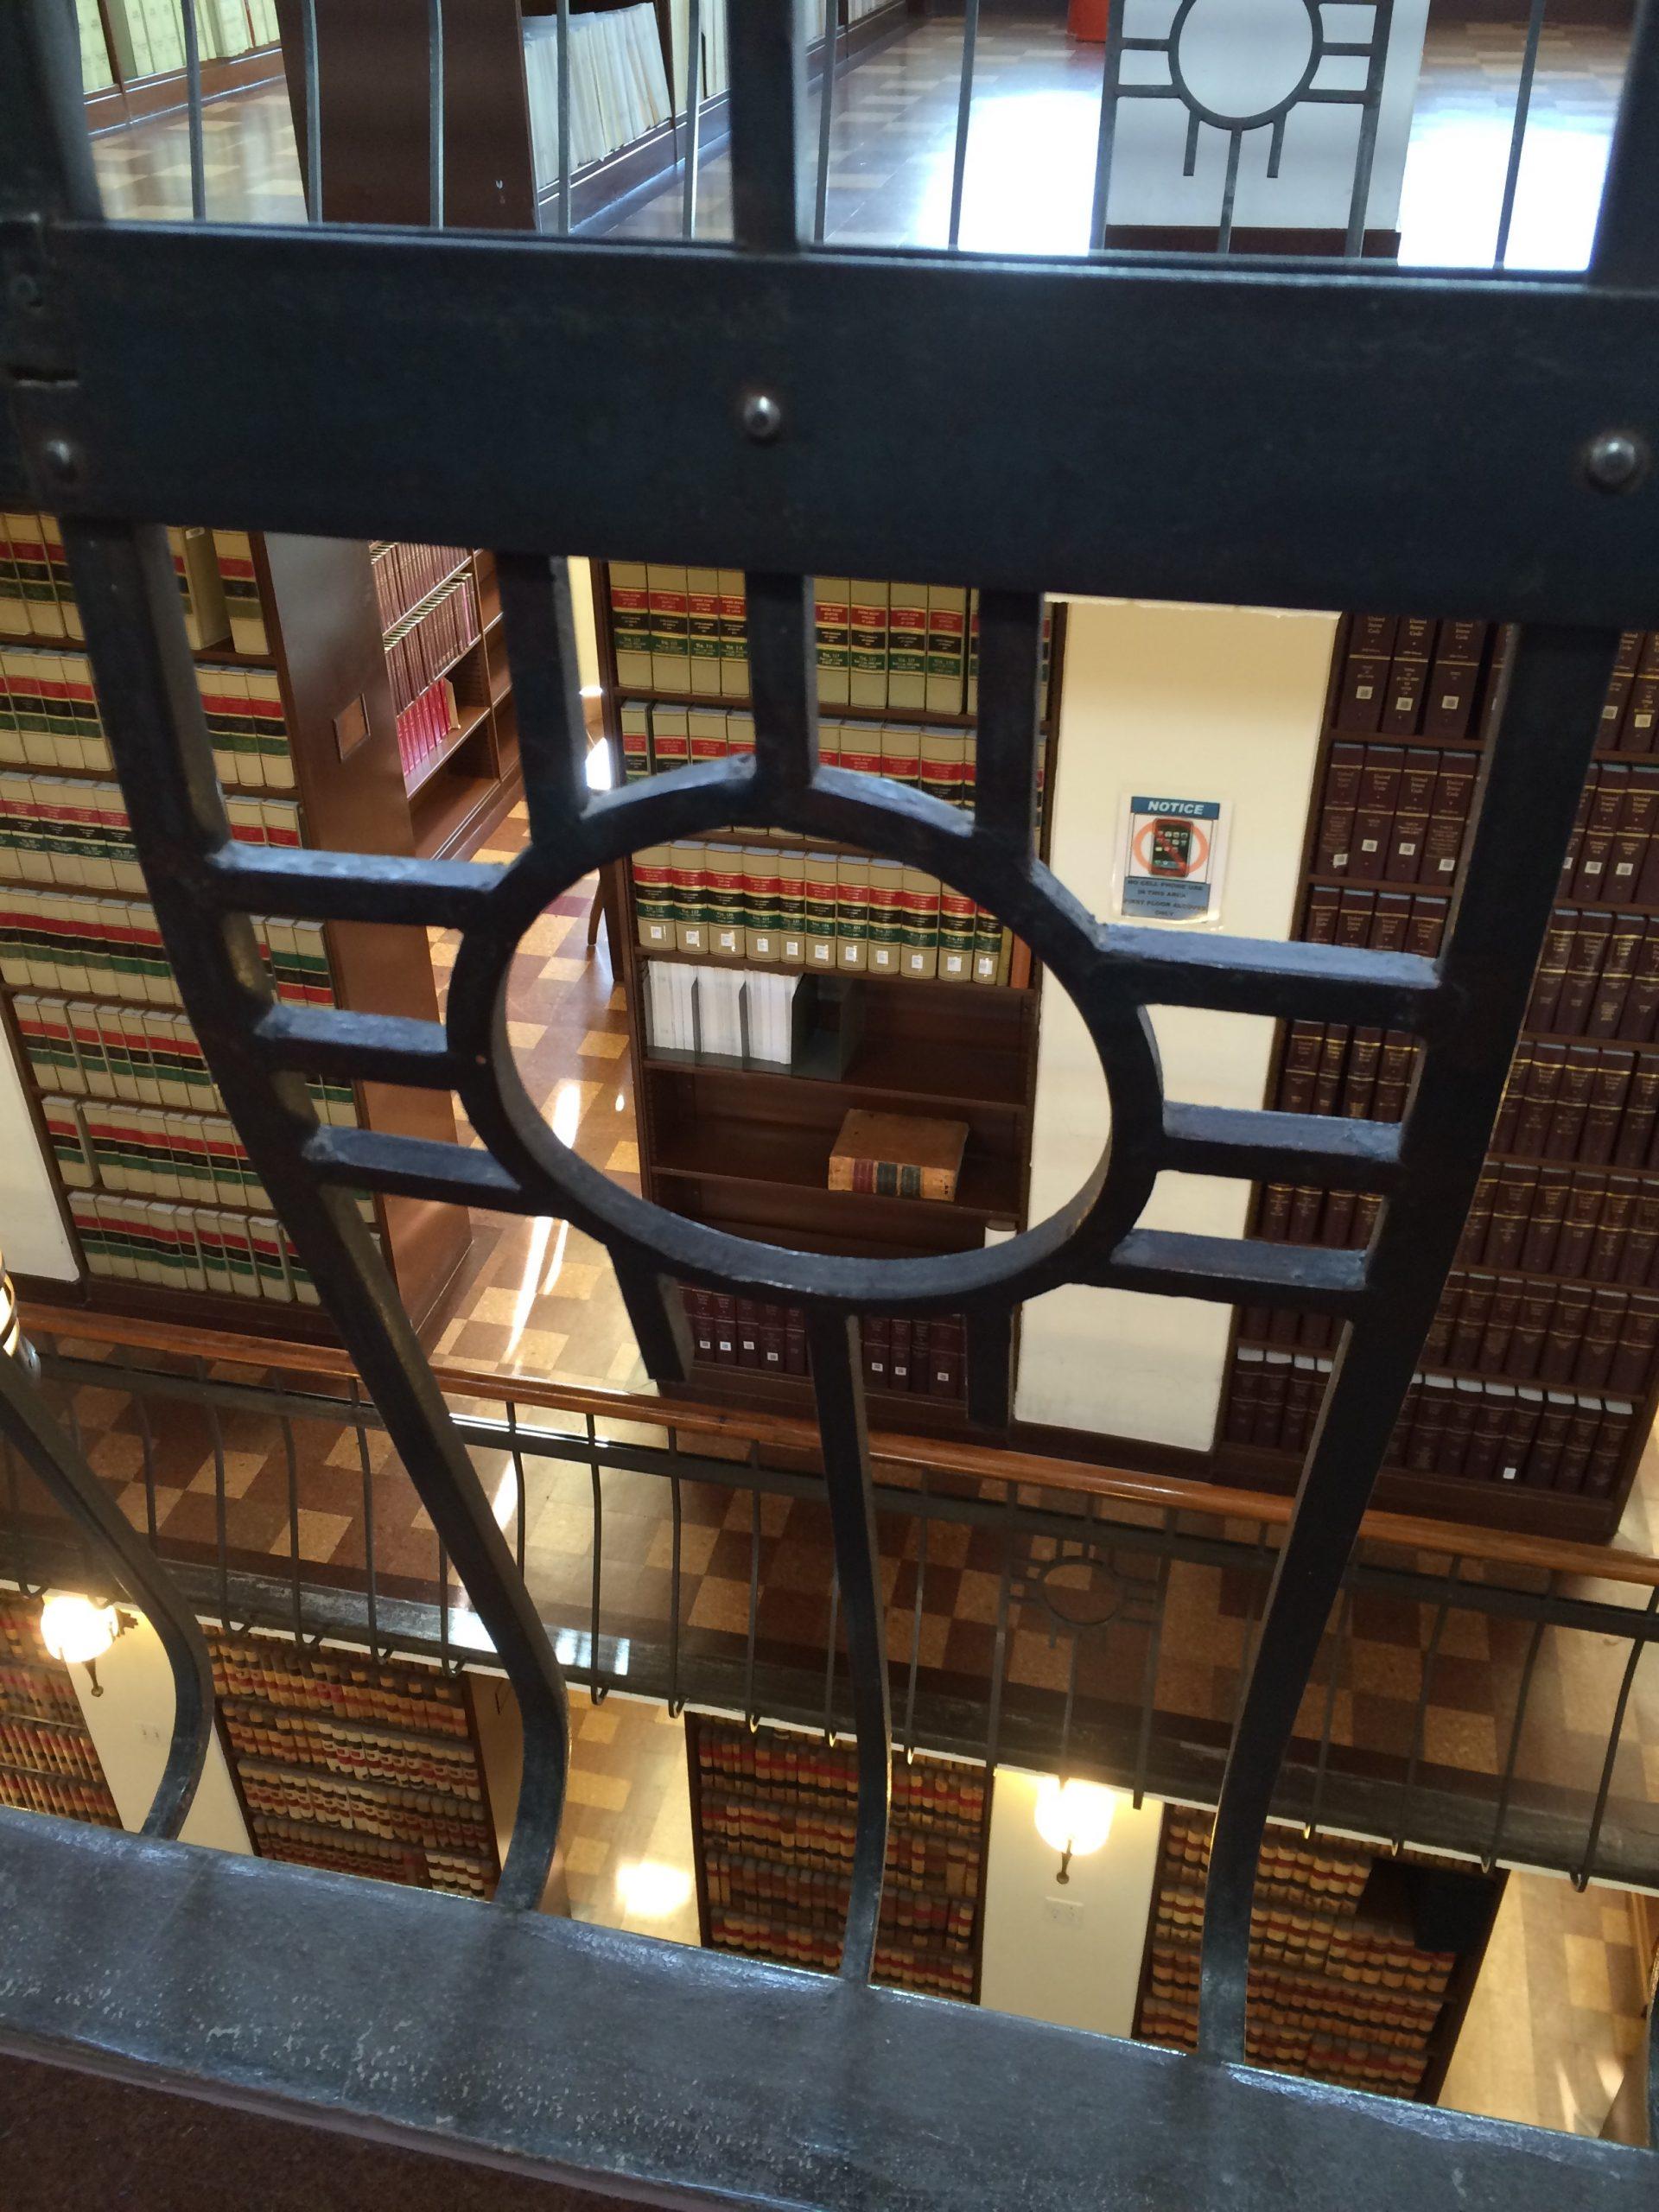 Zia symbol on railing of second floor